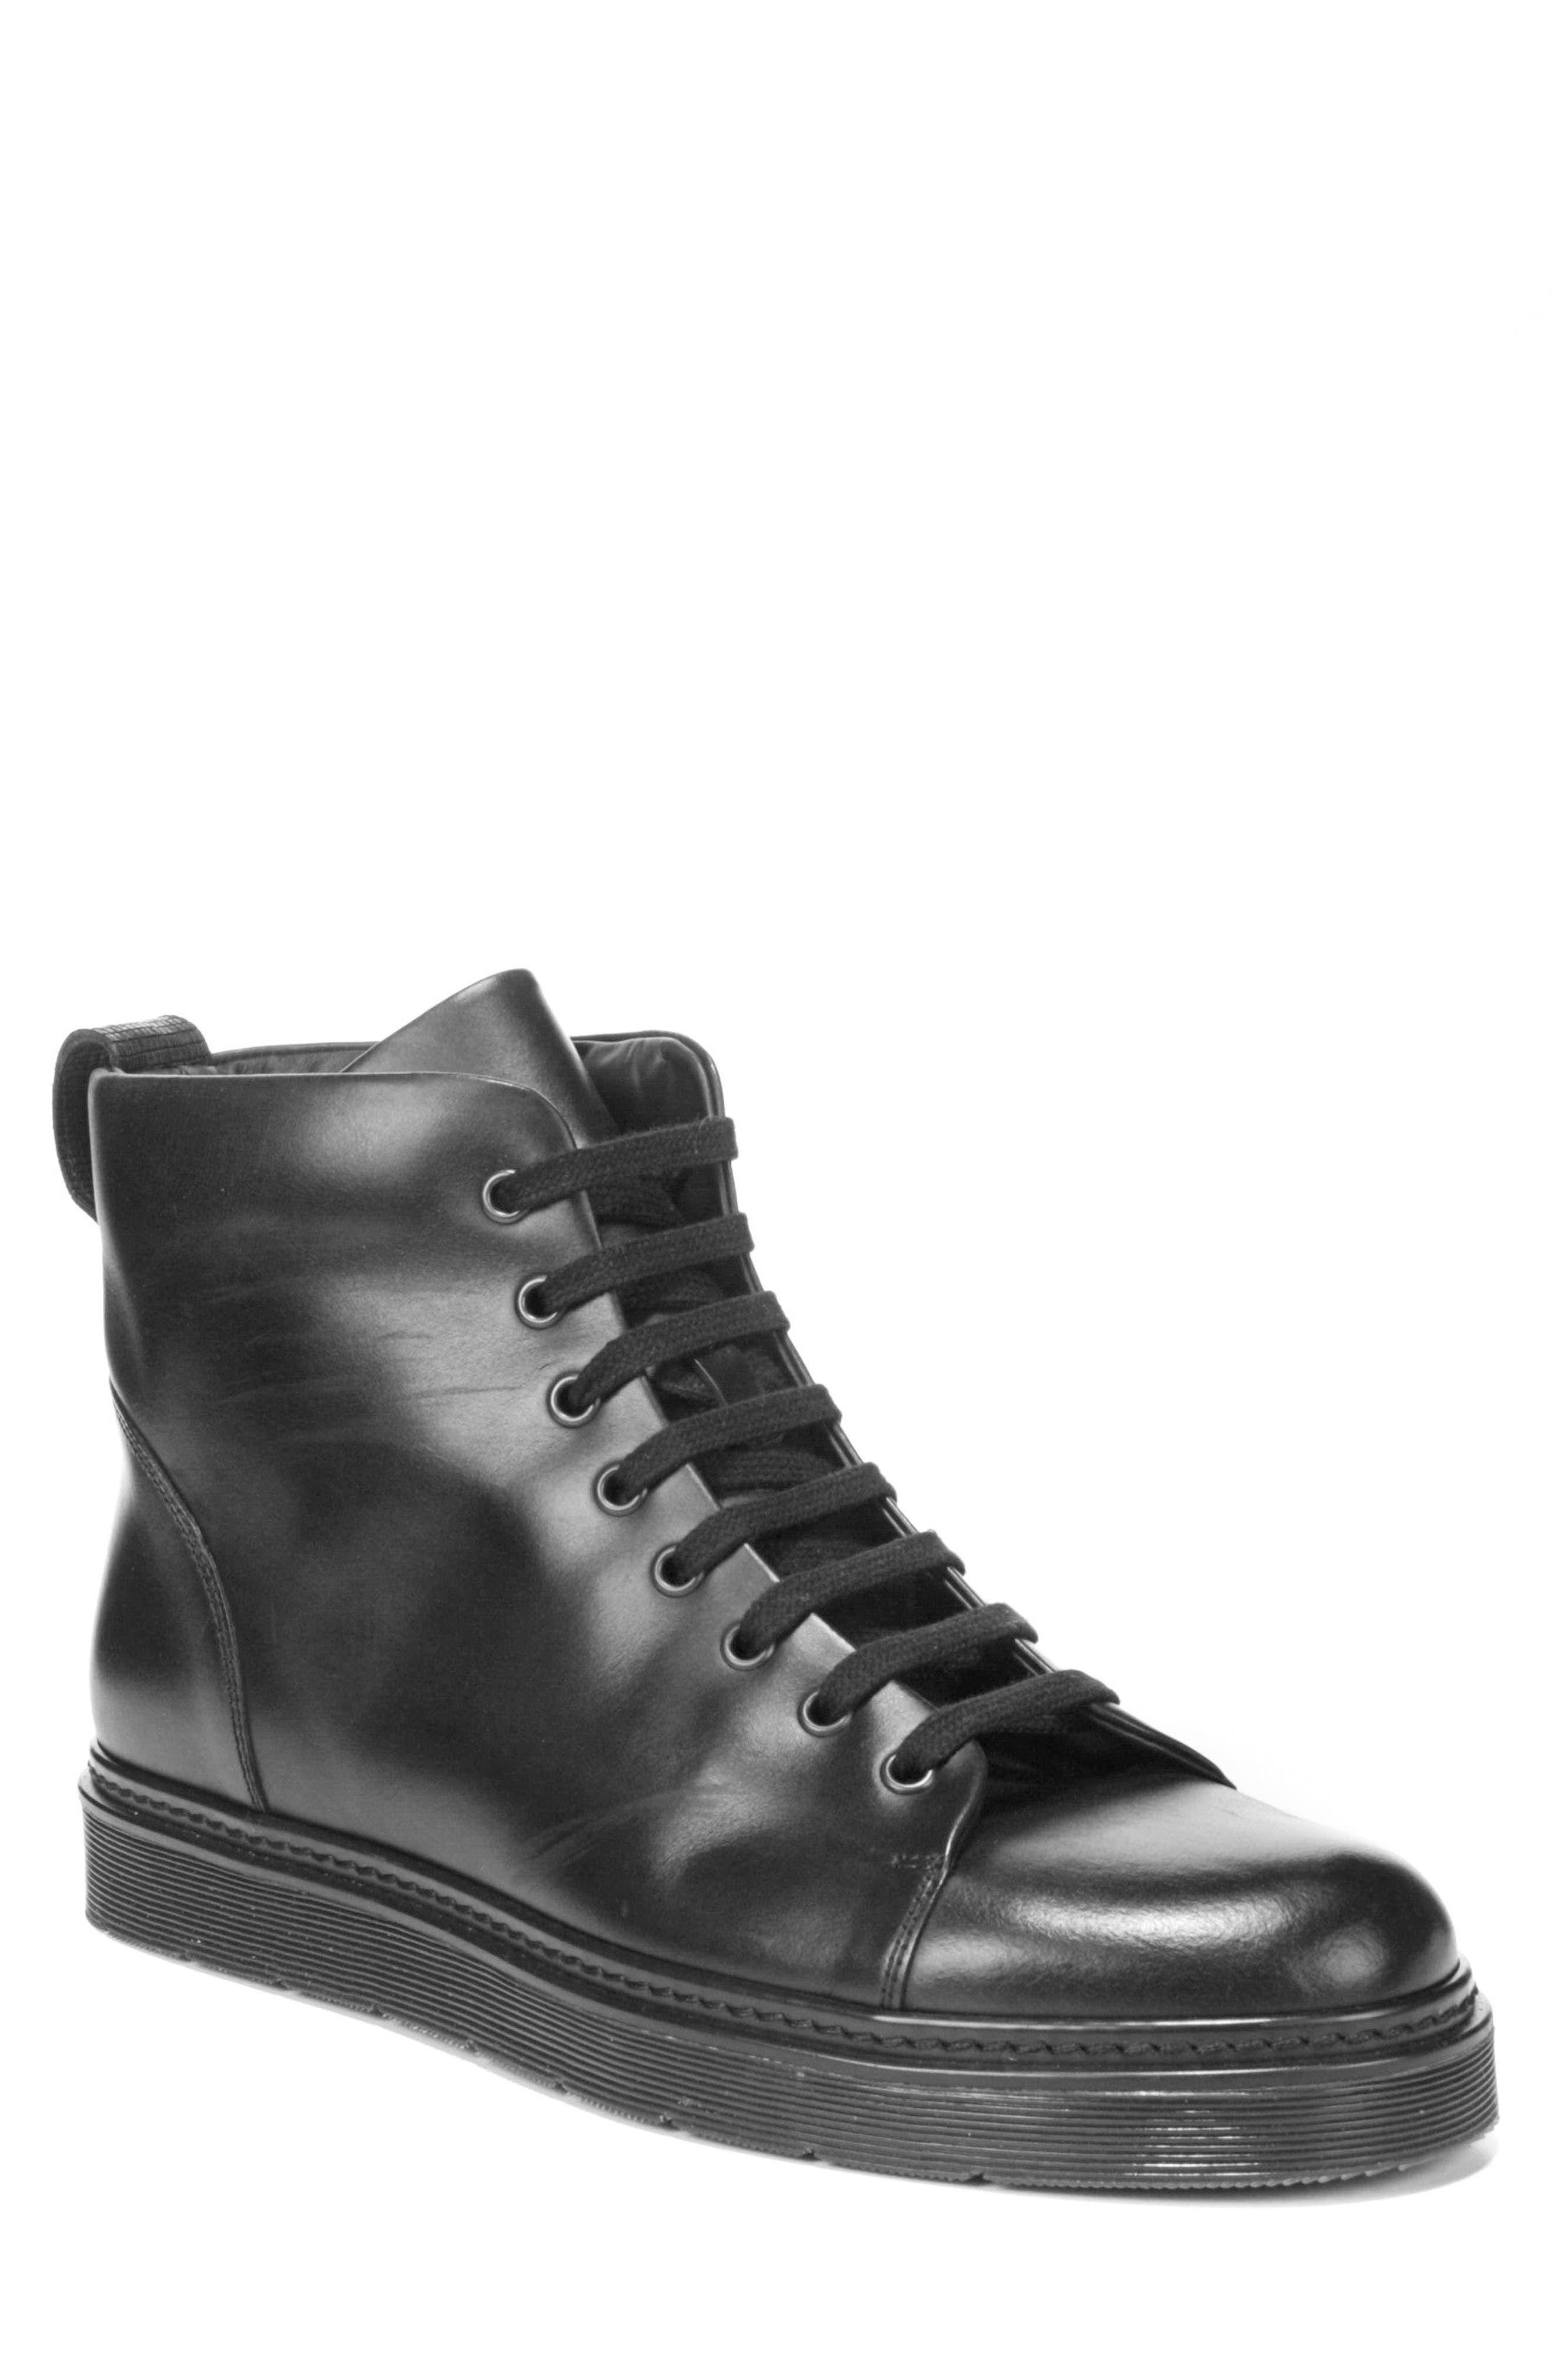 Malone Plain Toe Boot,                             Main thumbnail 1, color,                             001